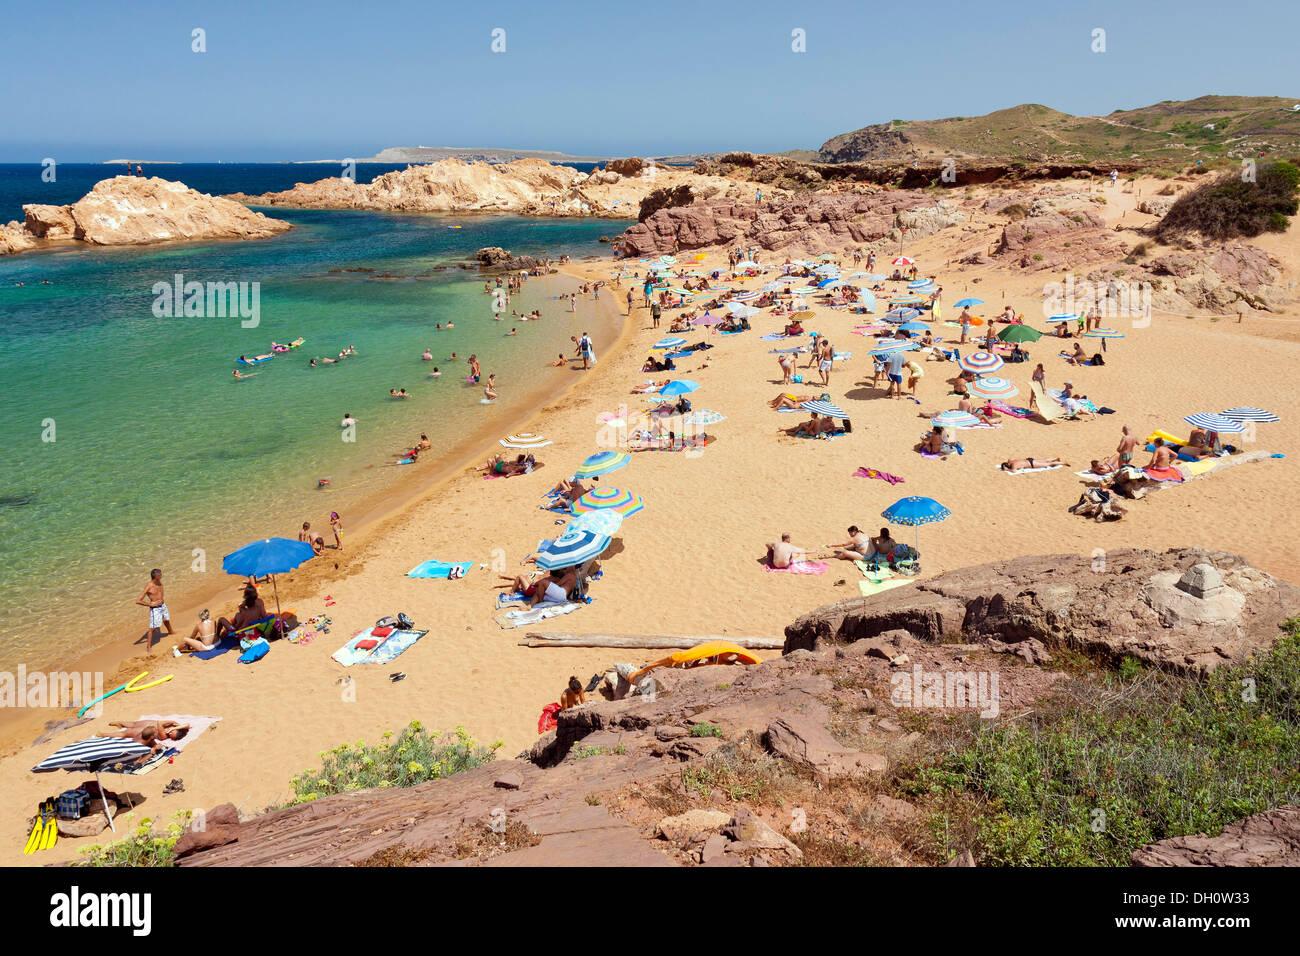 Unspoilt beach, Cala Pregonda bay, northern Menorca, Balearic Islands, Spain, Southern Europe, Europe - Stock Image